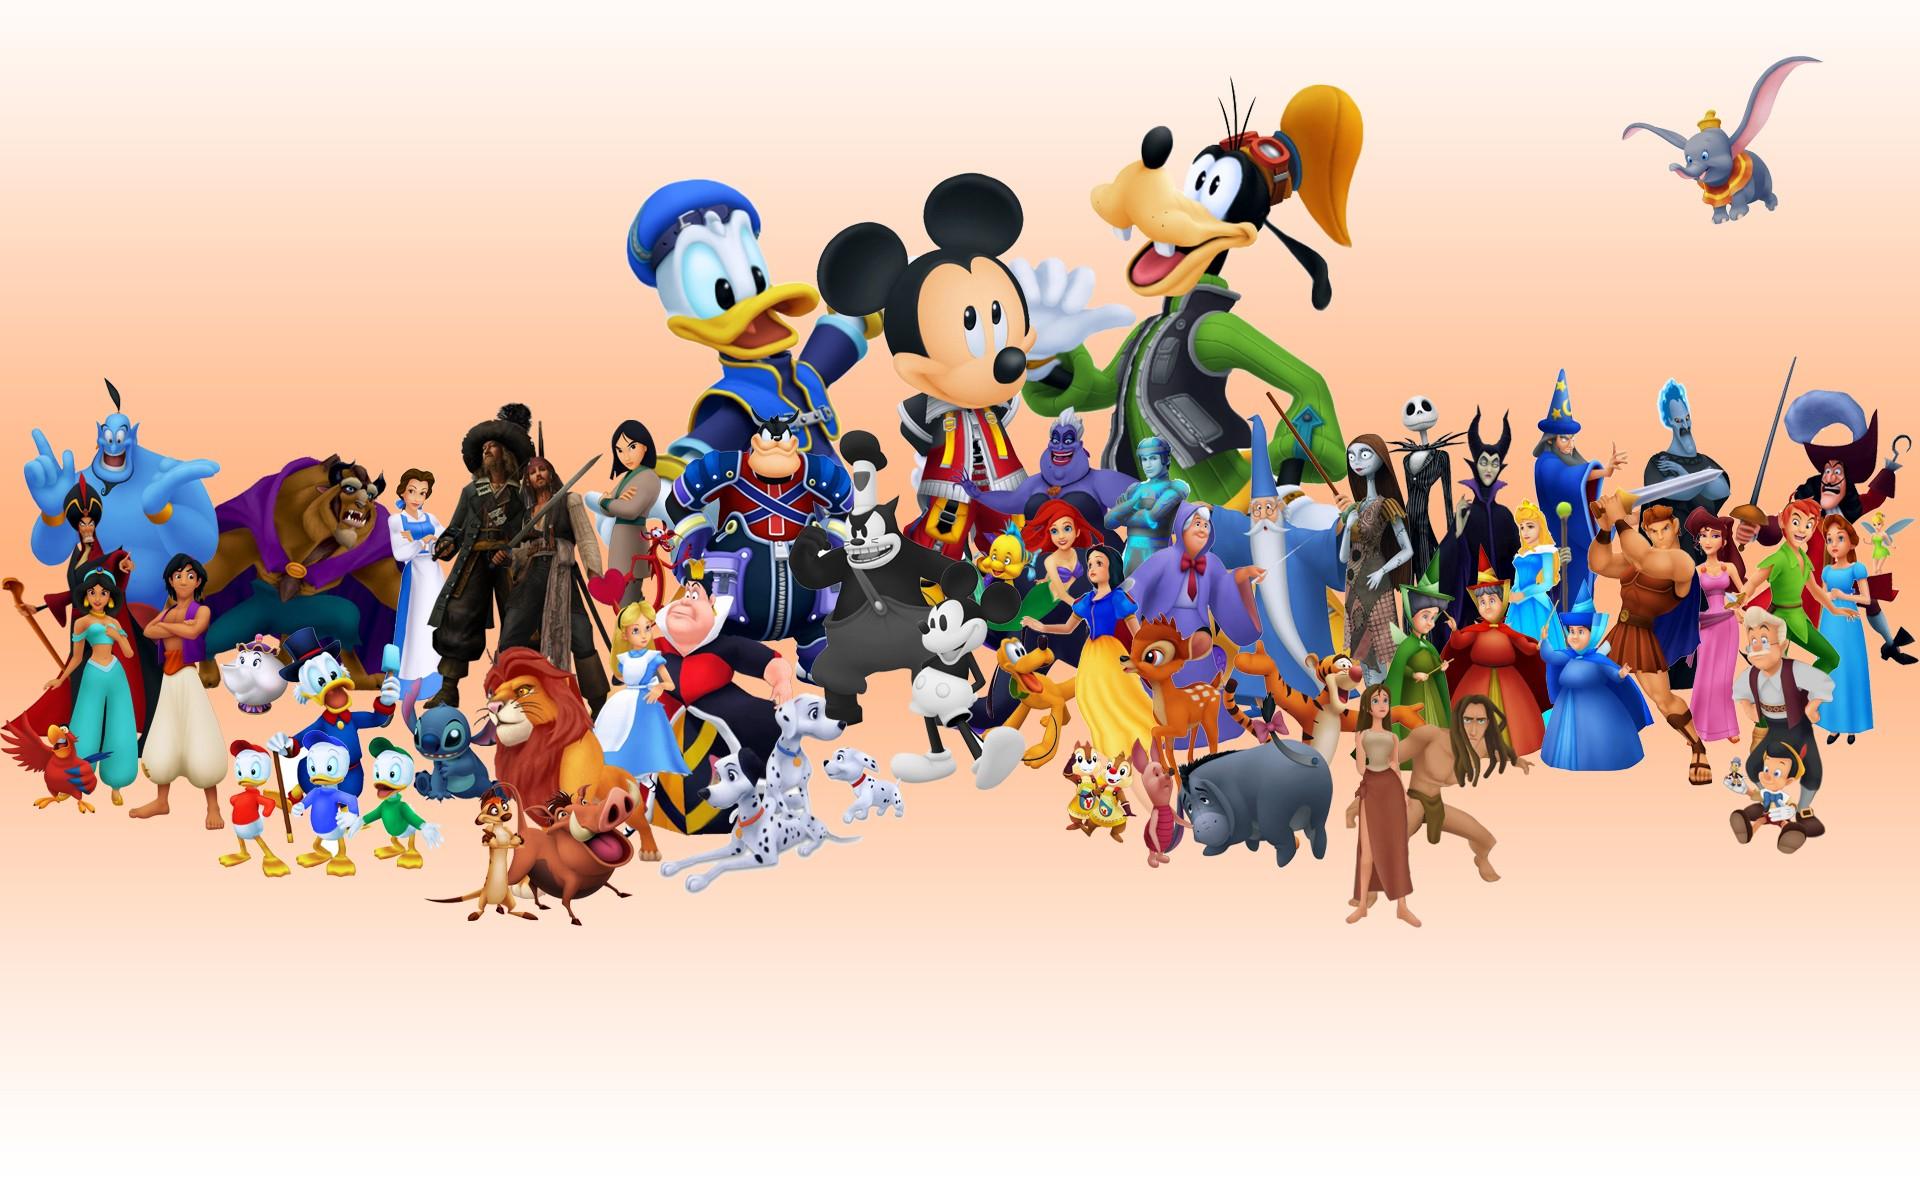 Walt Disney Wallpaper Download Wallpaper with 1920x1200 1920x1200